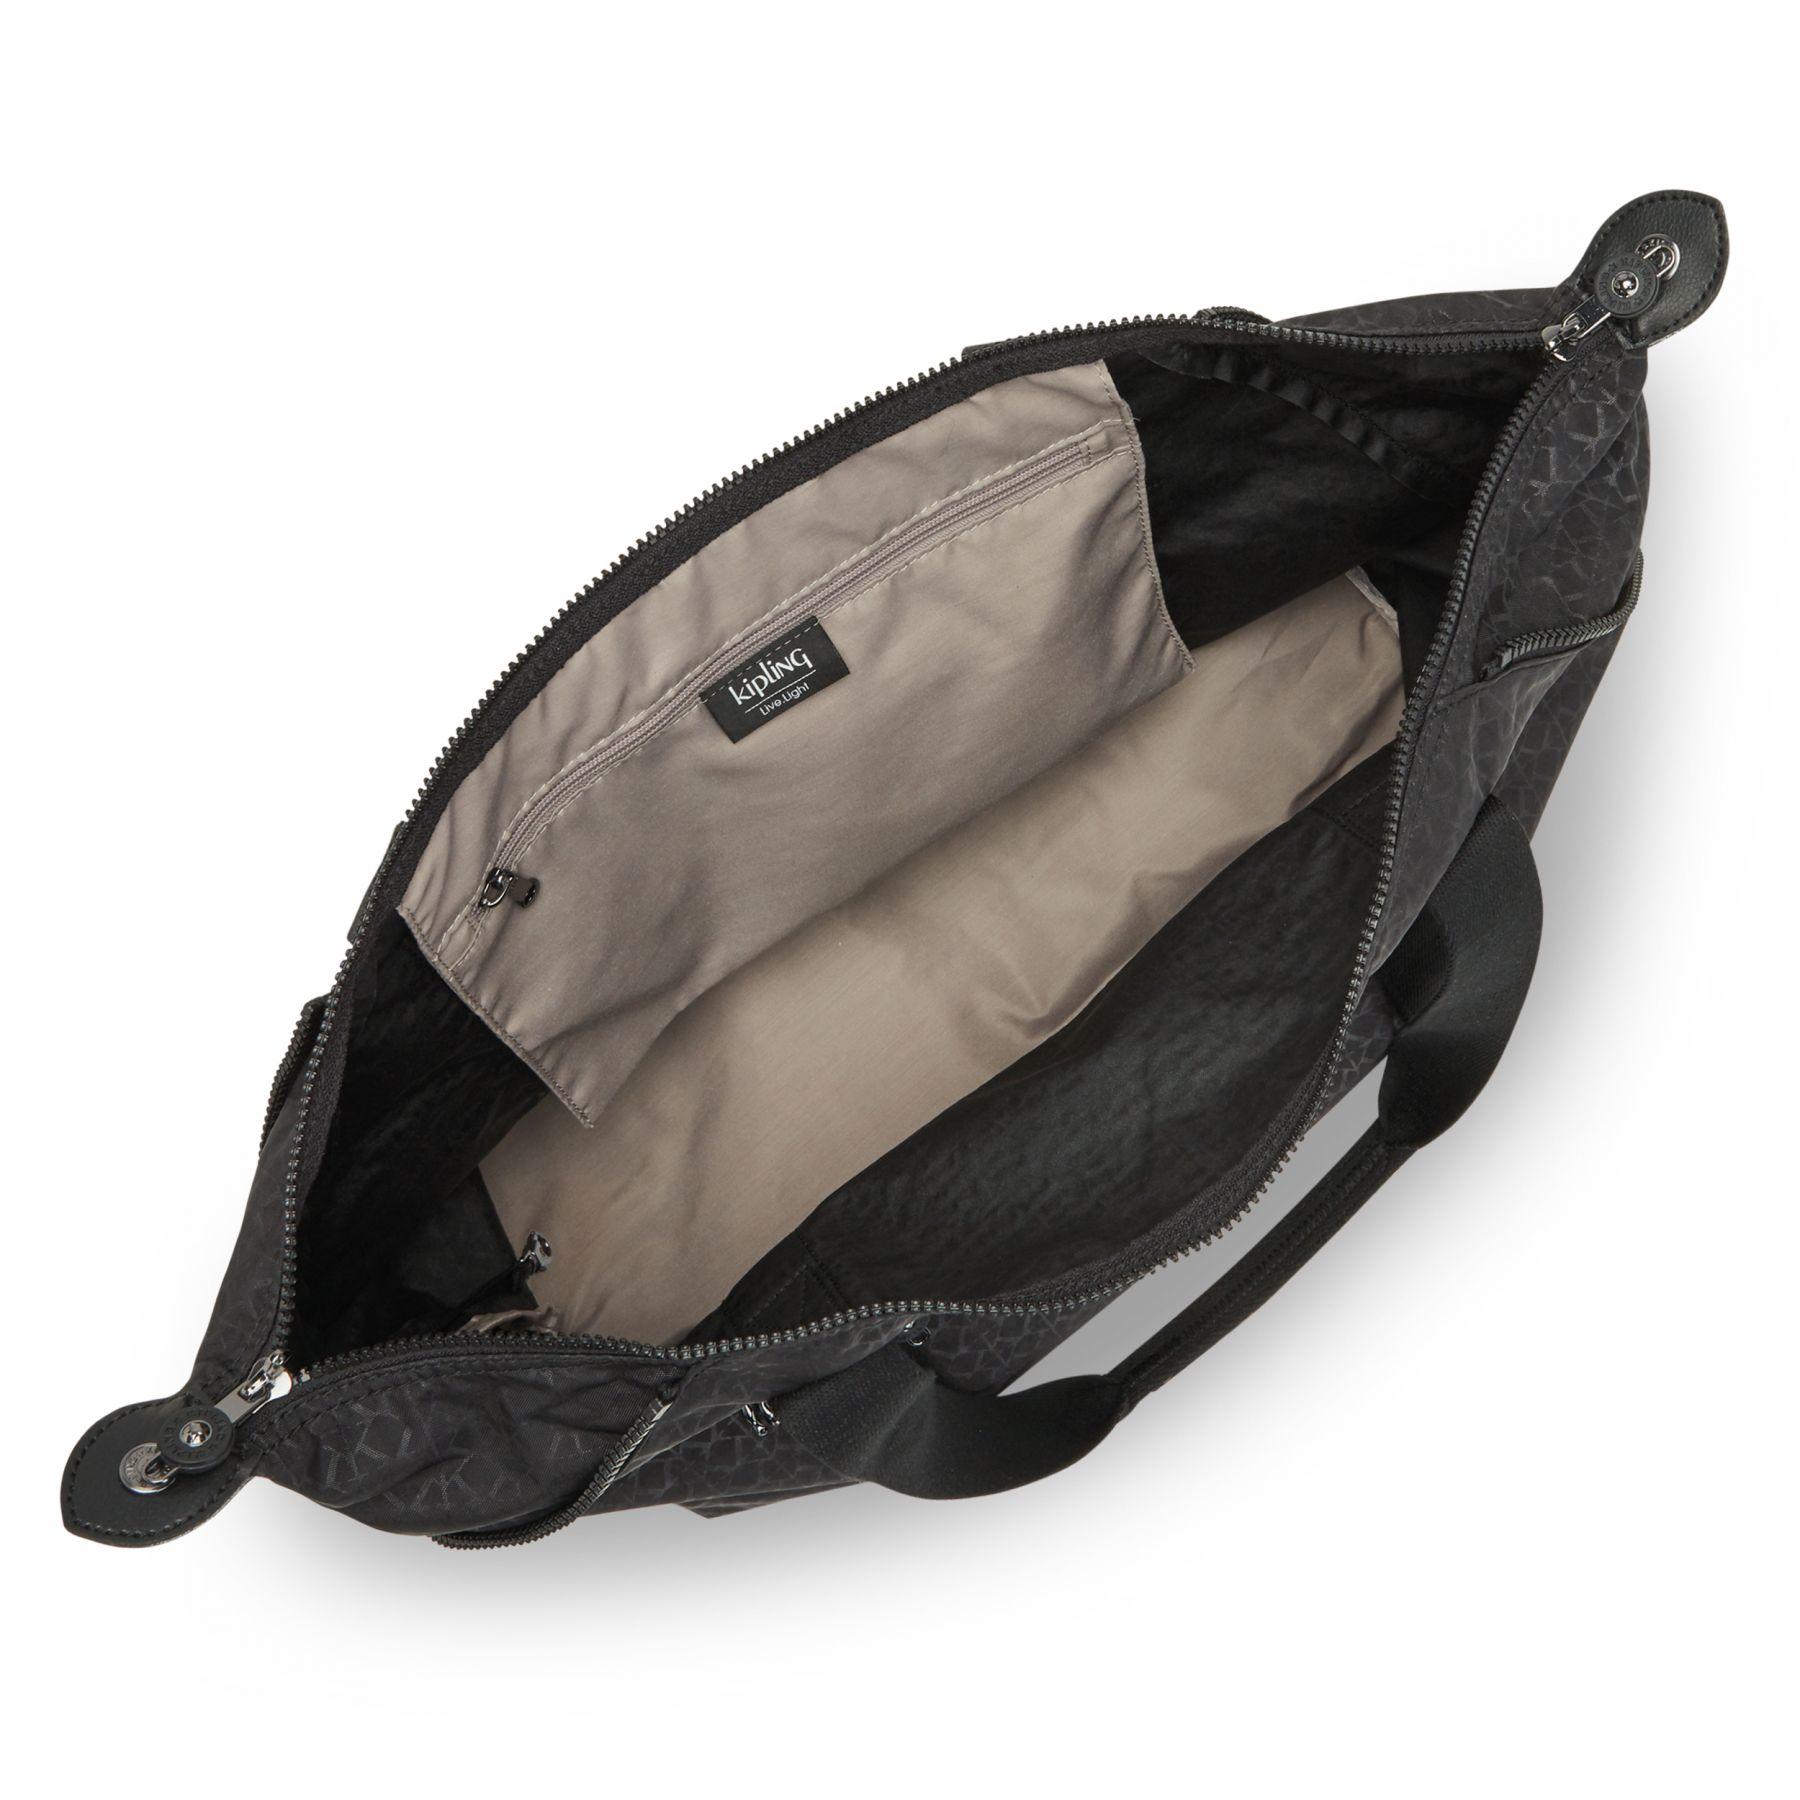 ART M BAGS by Kipling - Inside view